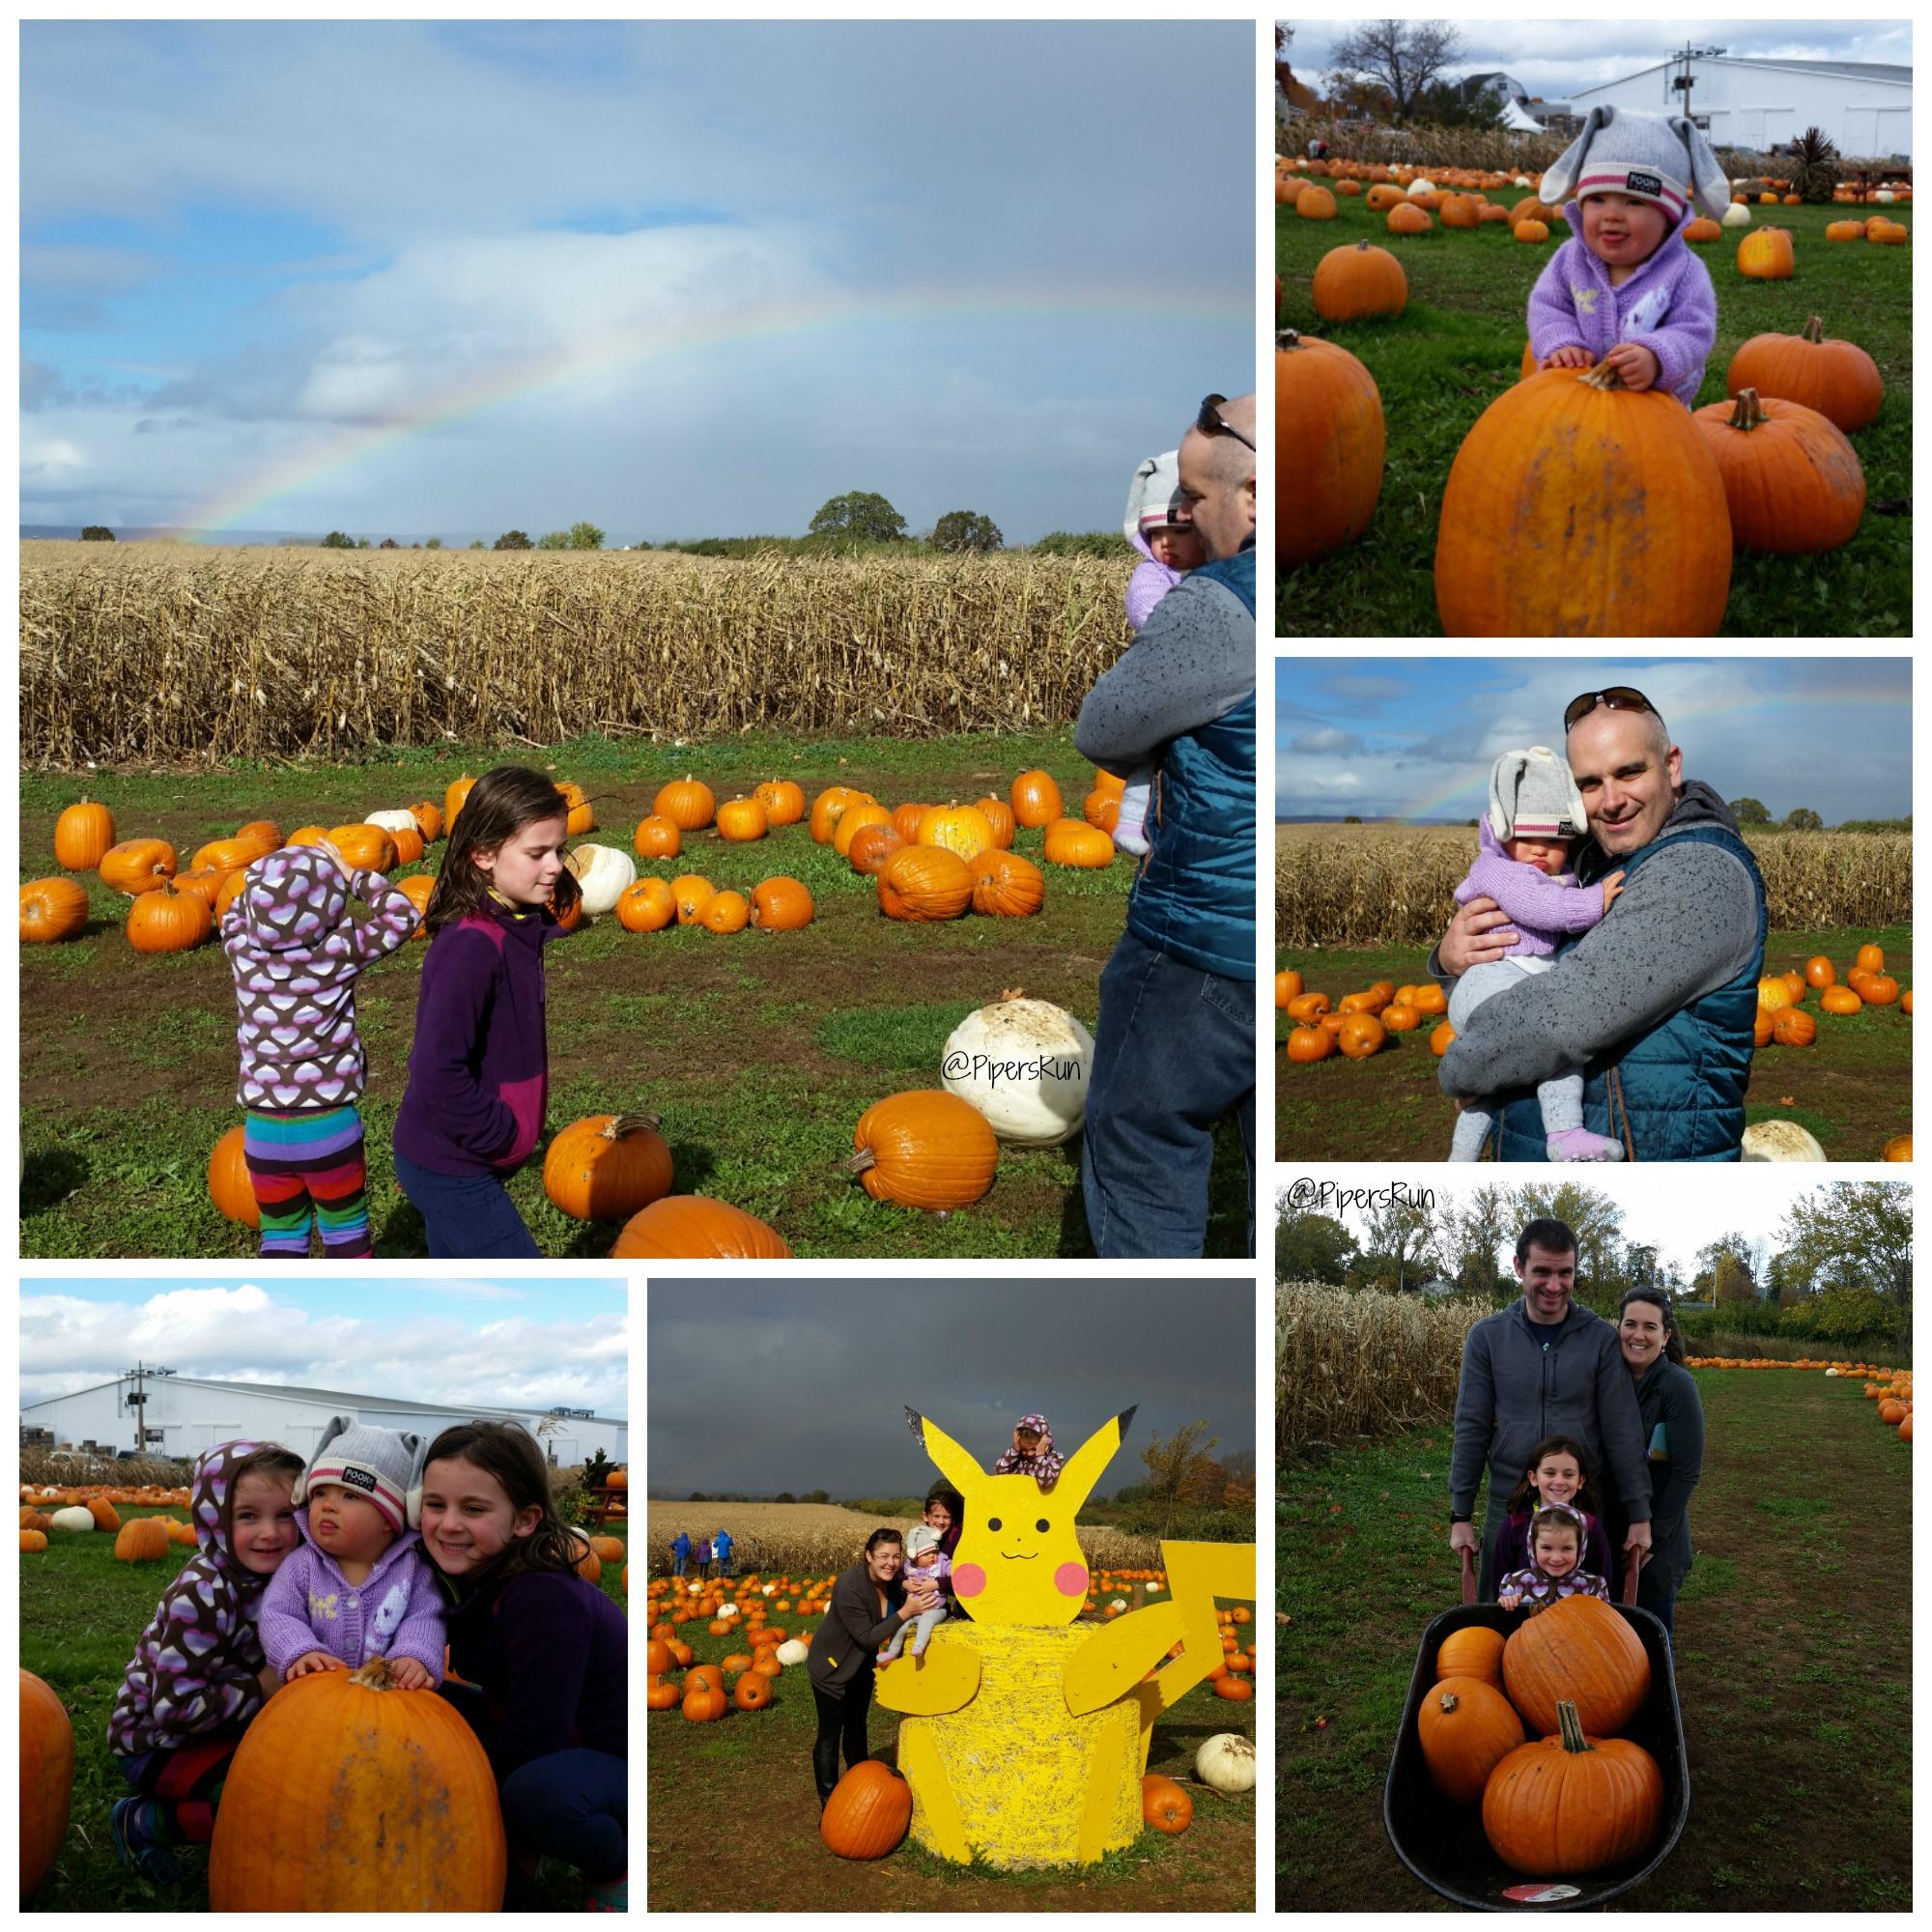 pr-pumpkin-picking-2016